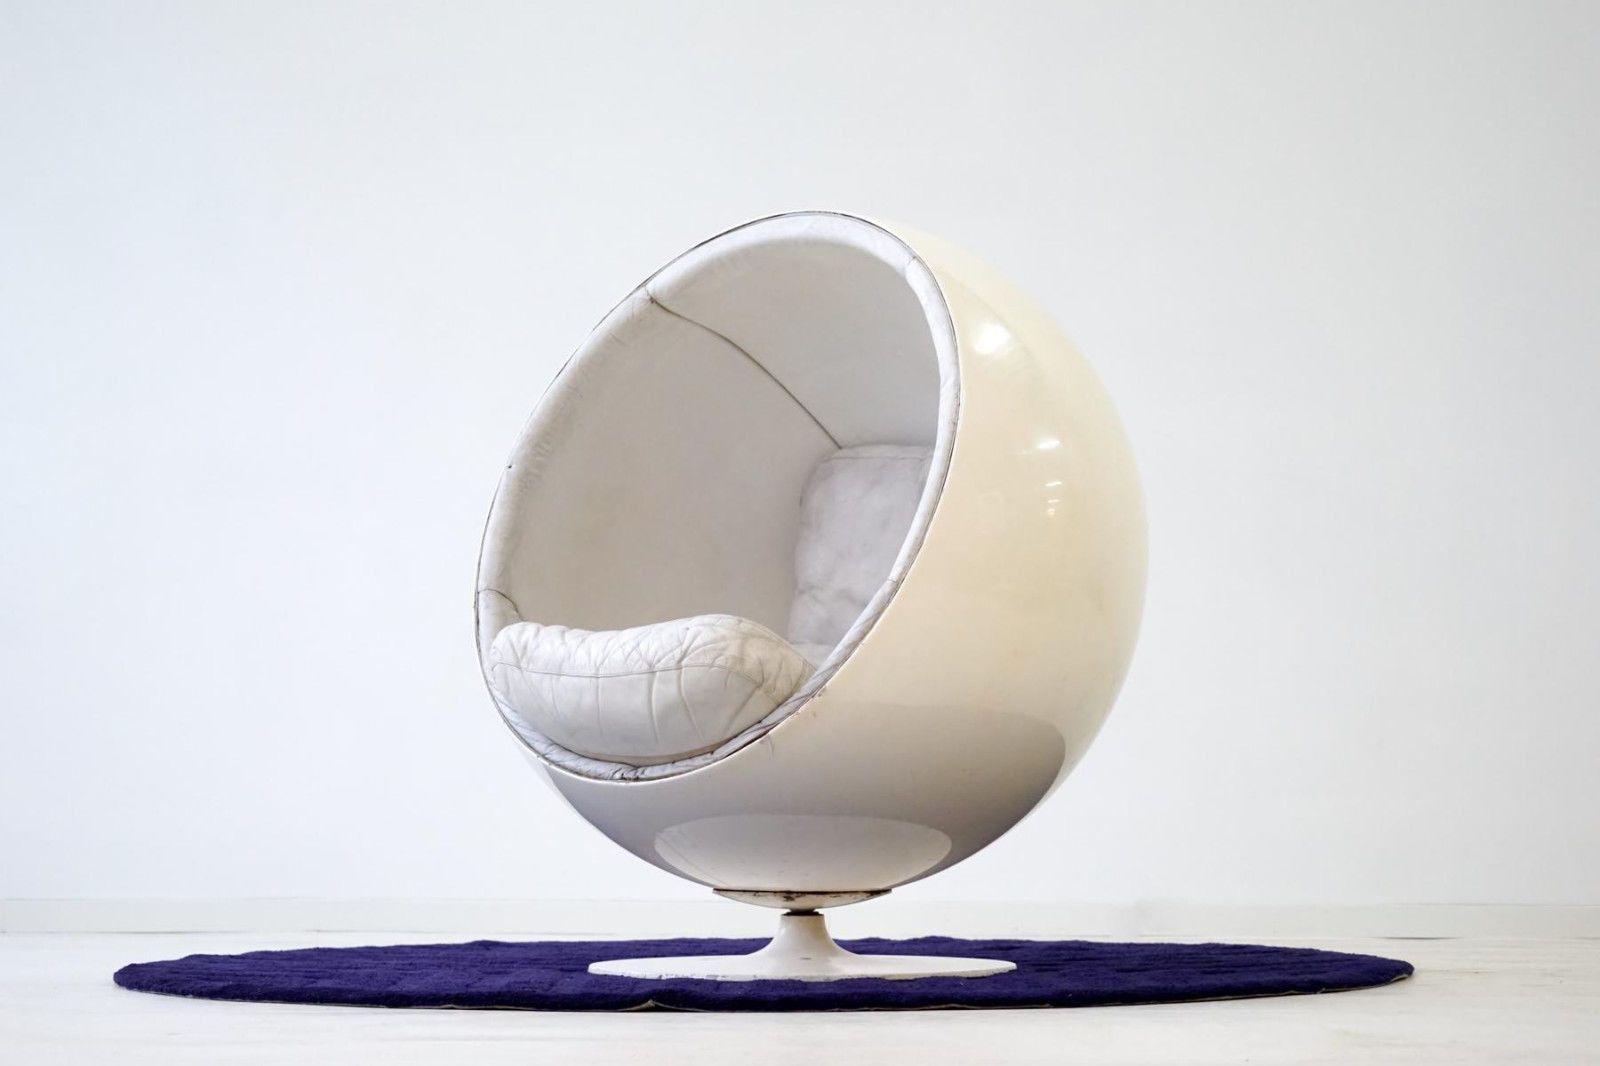 Kugelsessel Ikea original asko chairball kugel sessel eero aarnio asko designgut